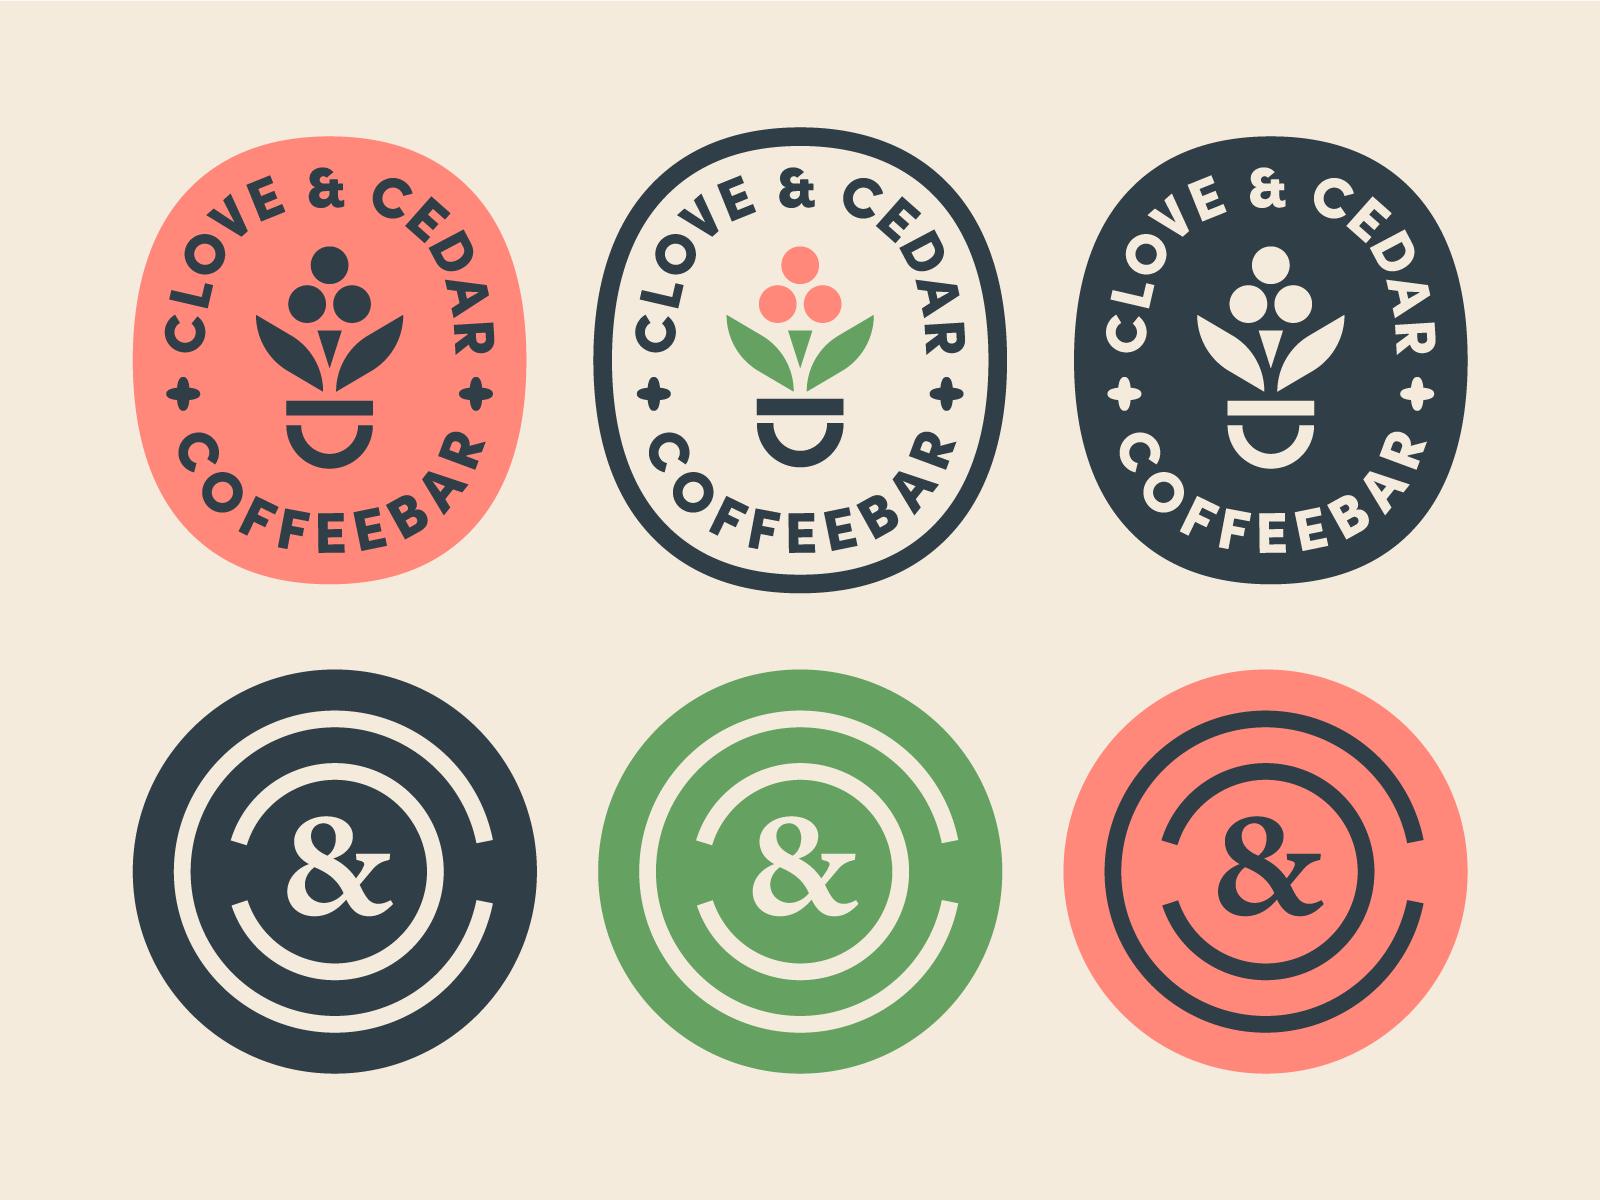 Cafe Branding Cafe branding, Logos design, Coffee logo